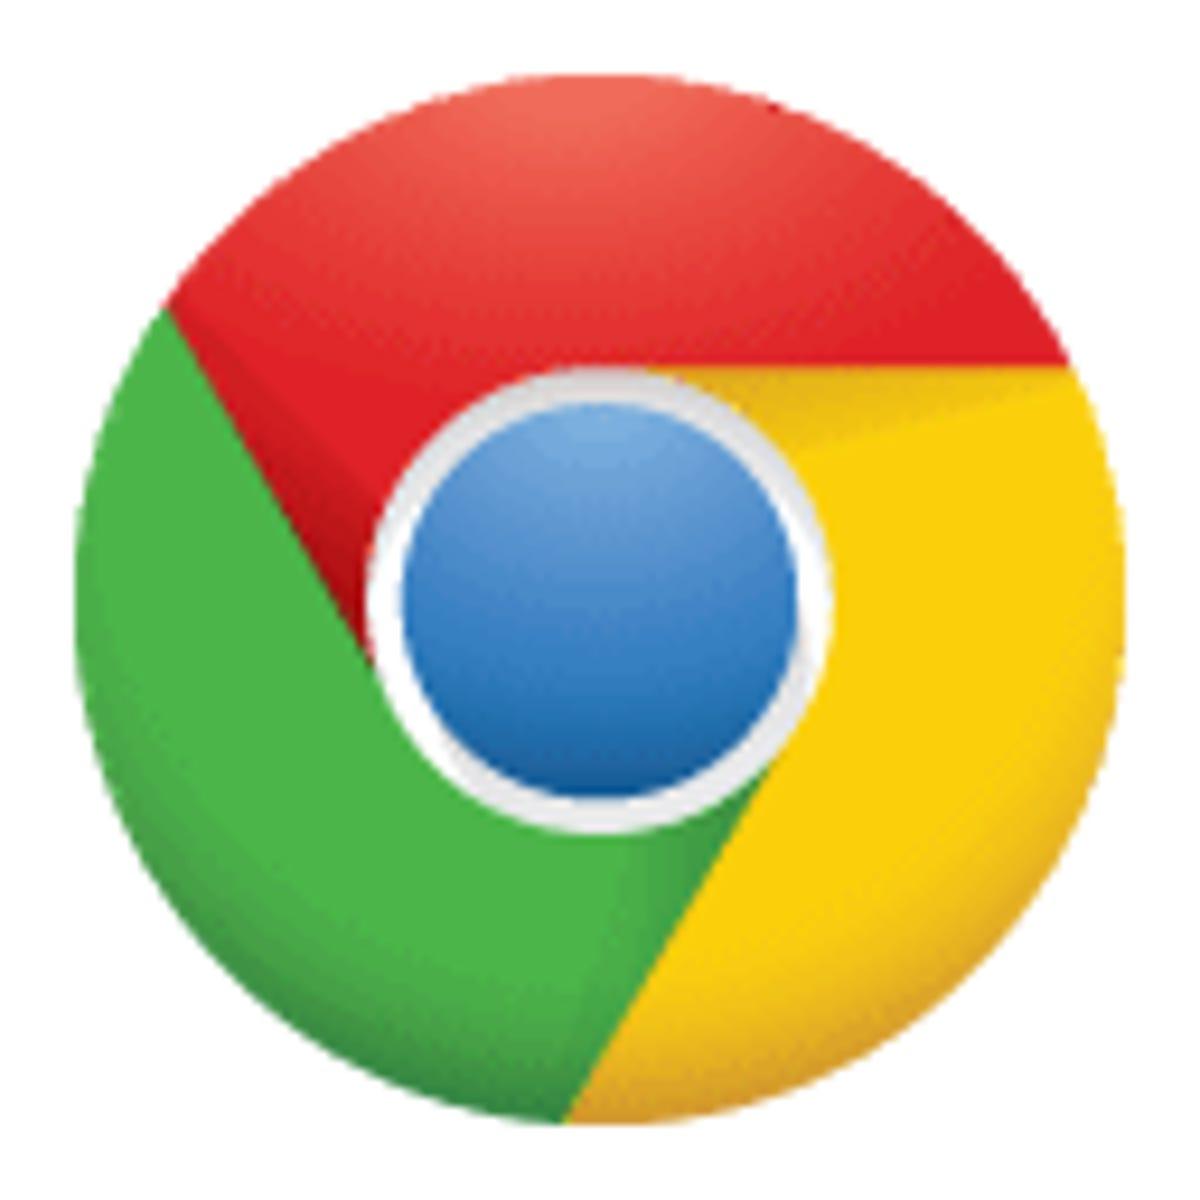 Google's latest Chrome update tightens the locks on Adobe Flash